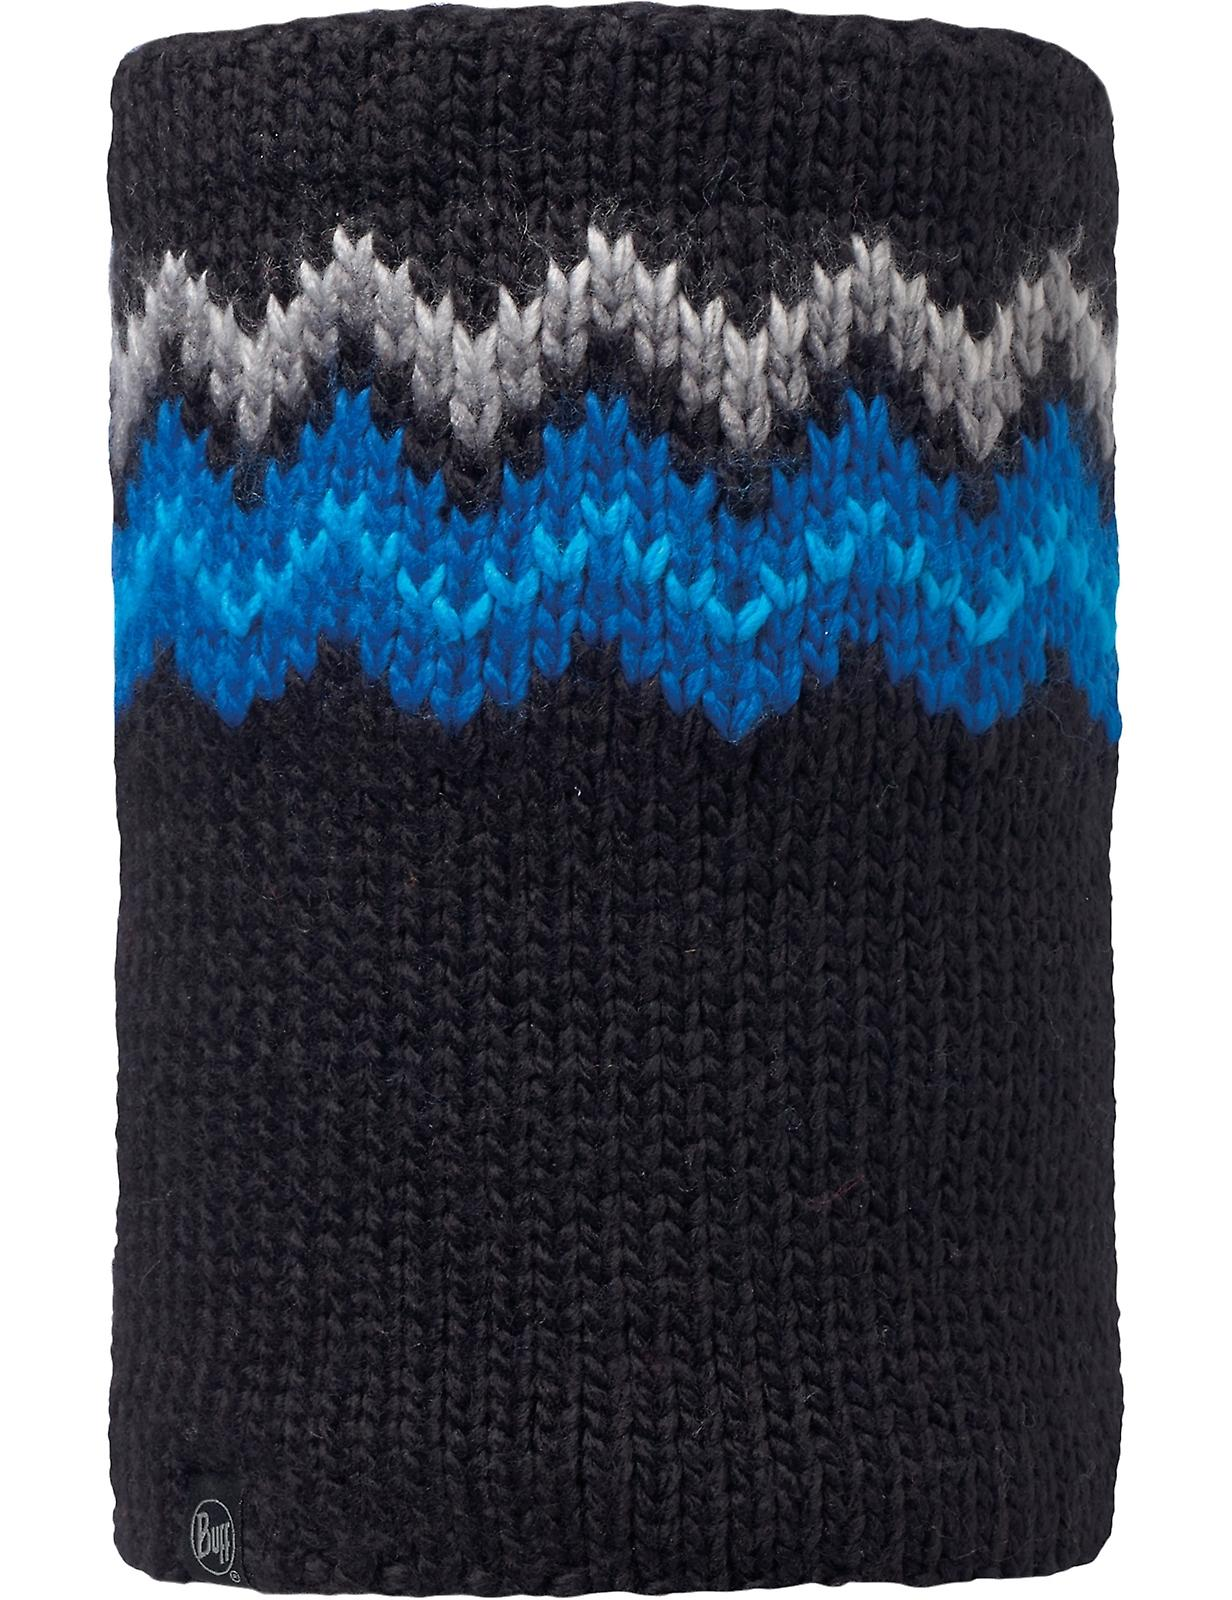 af08fff23fe Buff Danke Knitted Neck Warmer